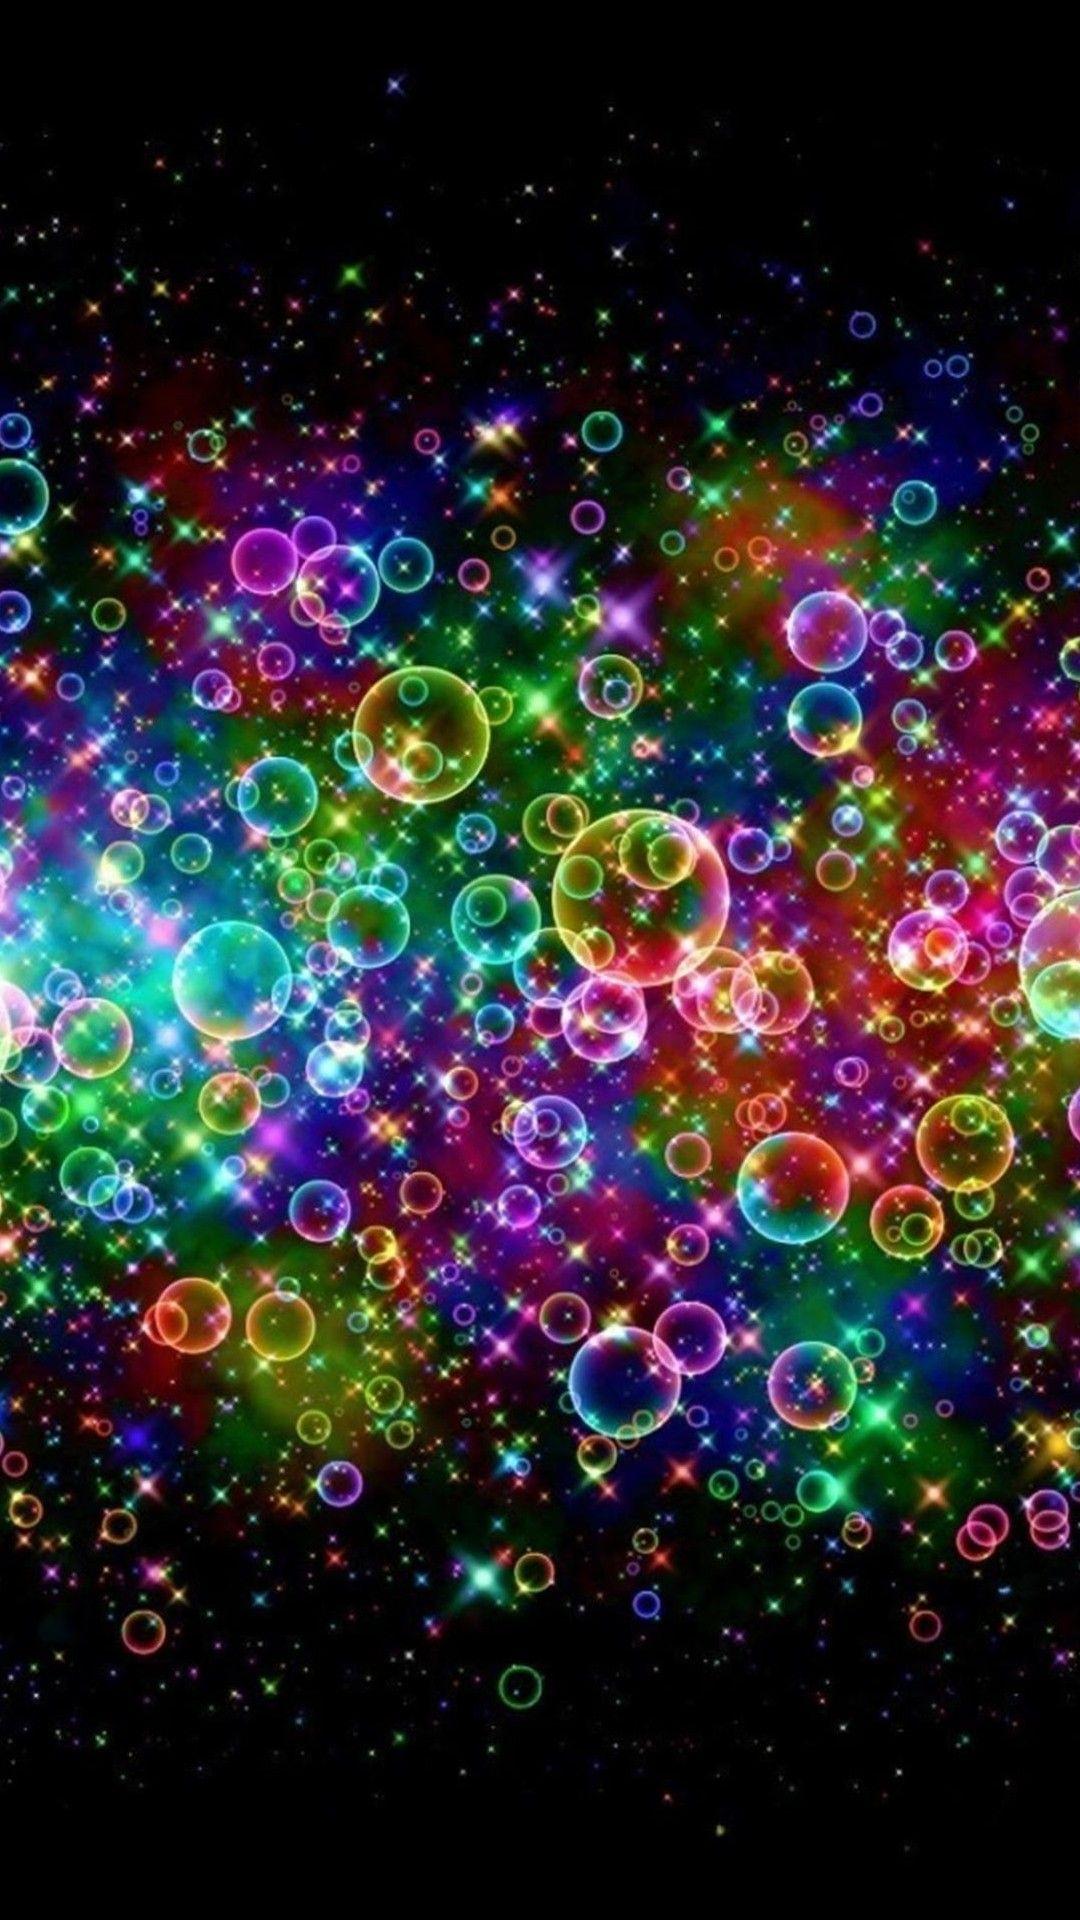 Rainbow Colored Soap Bubbles iPhone 6 Plus HD Wallpaper